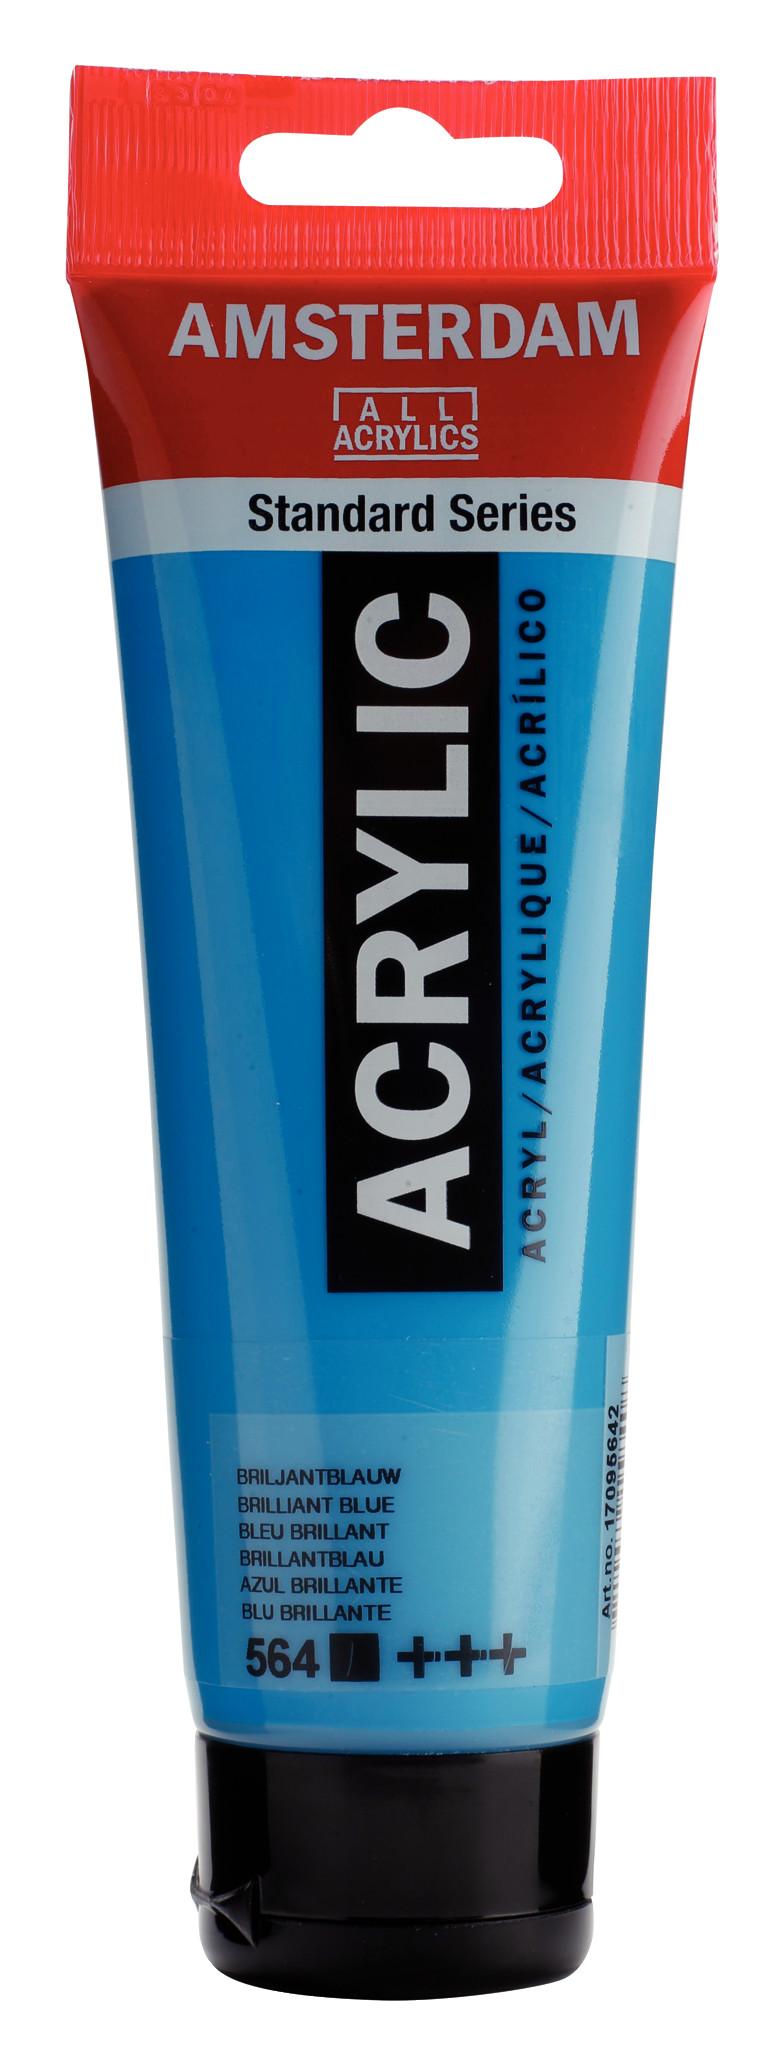 Amsterdam Standard Series Acrylic Tube 120 ml Brilliant blue 564